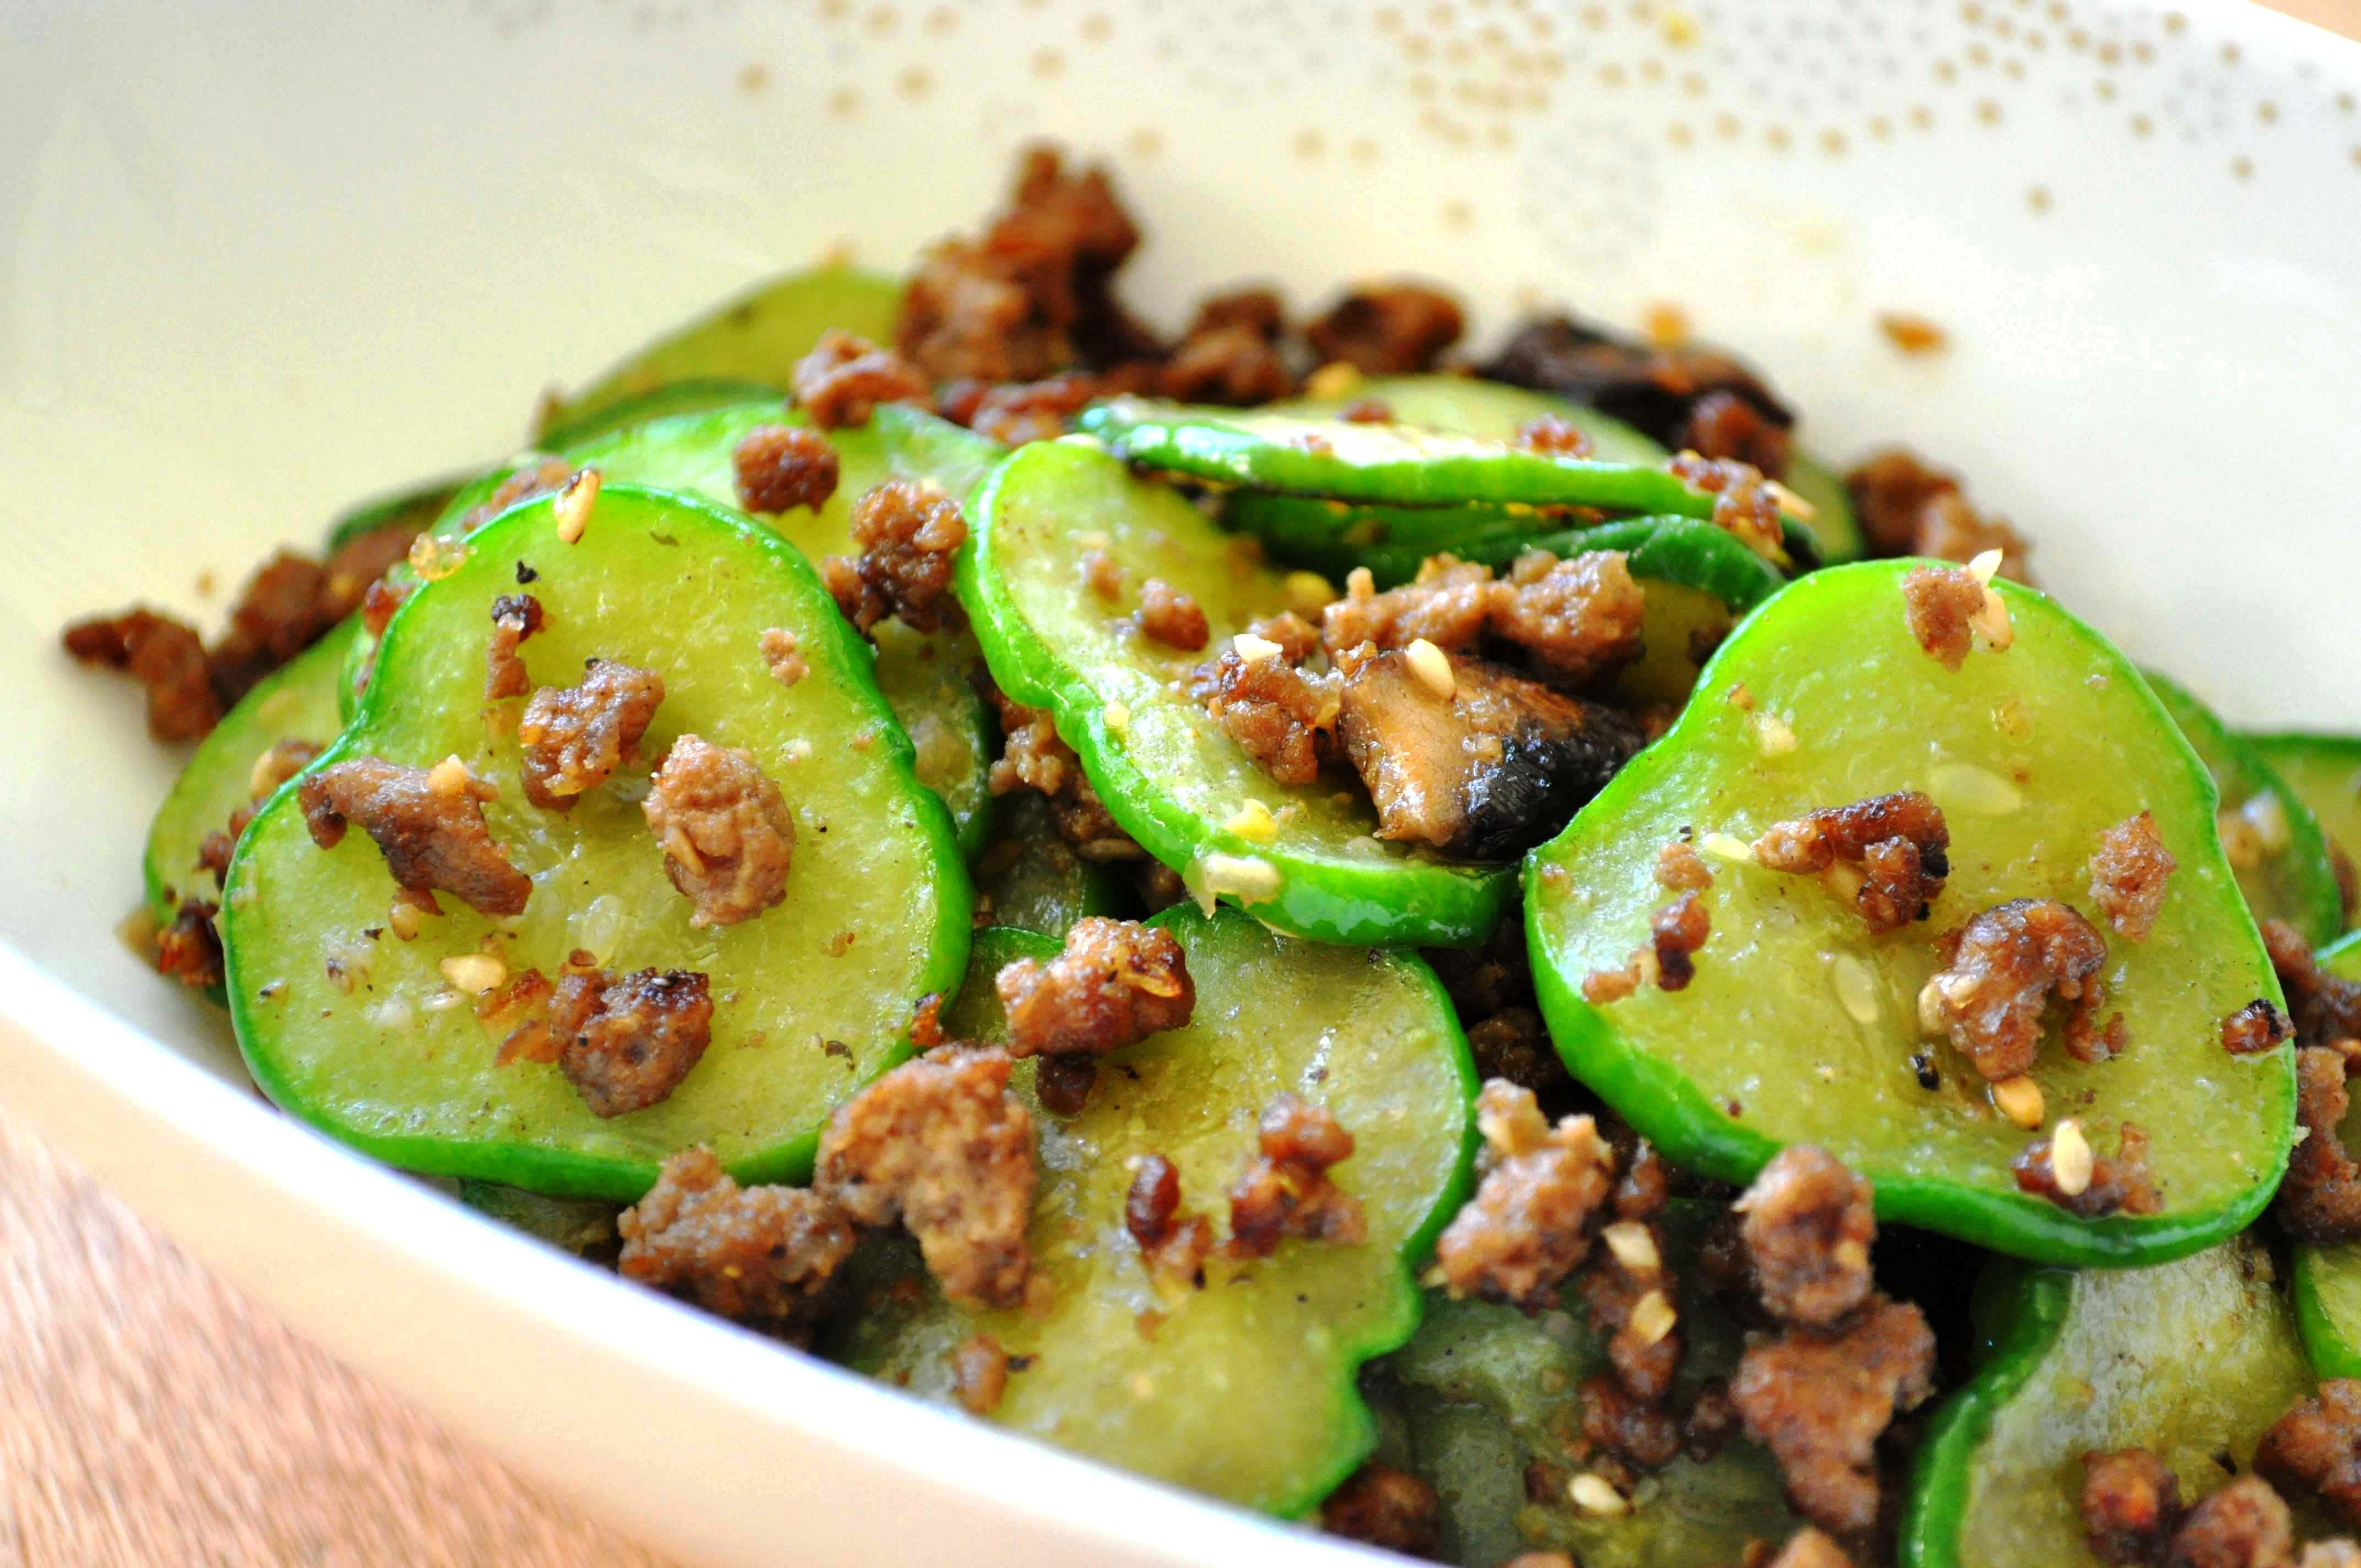 Korean sauteed cucumber namul